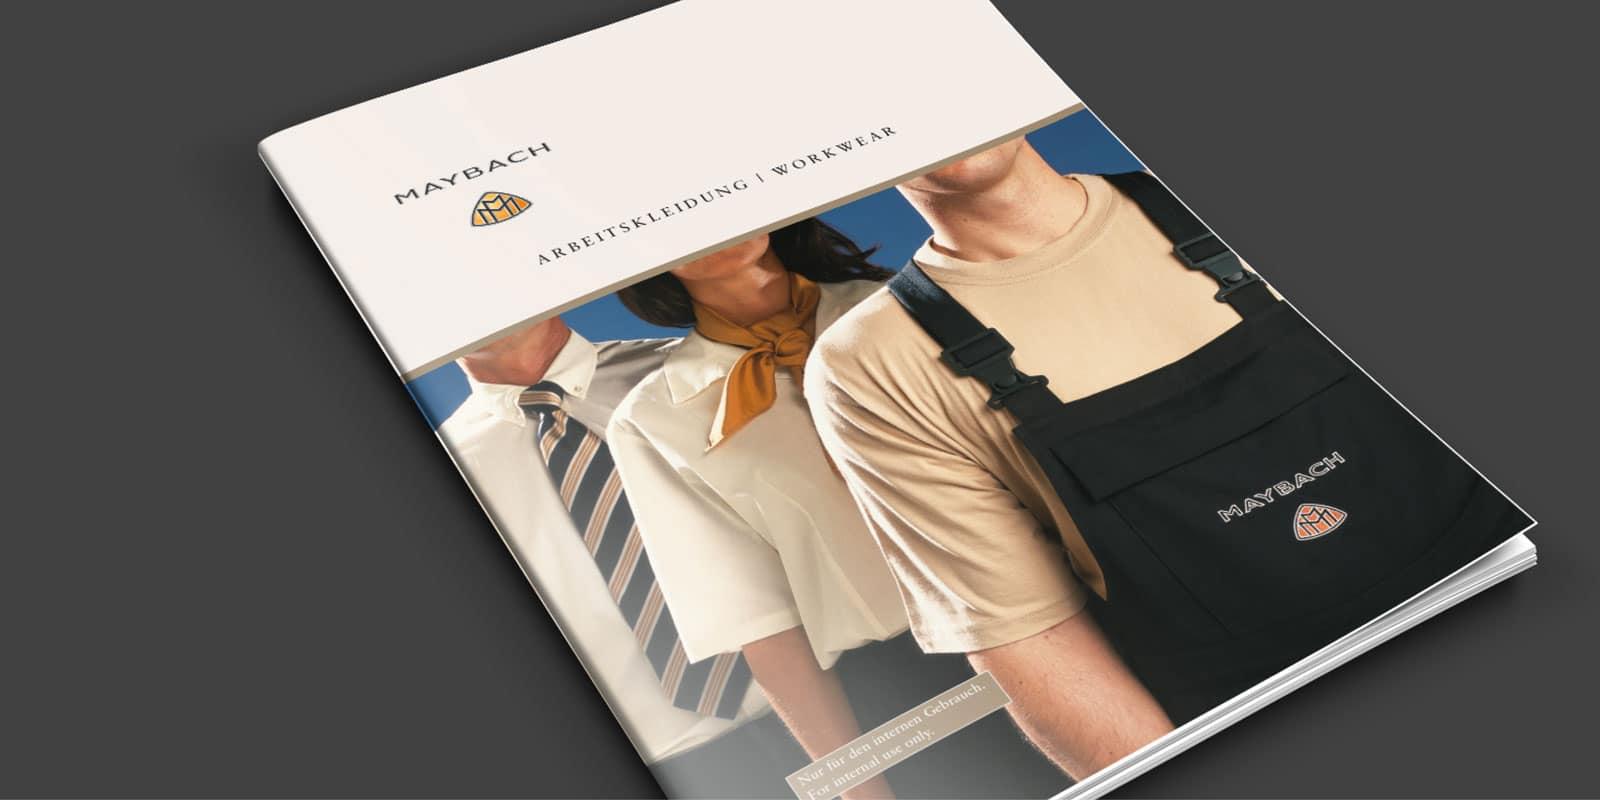 Maybach – Broschüre Arbeitskleidung